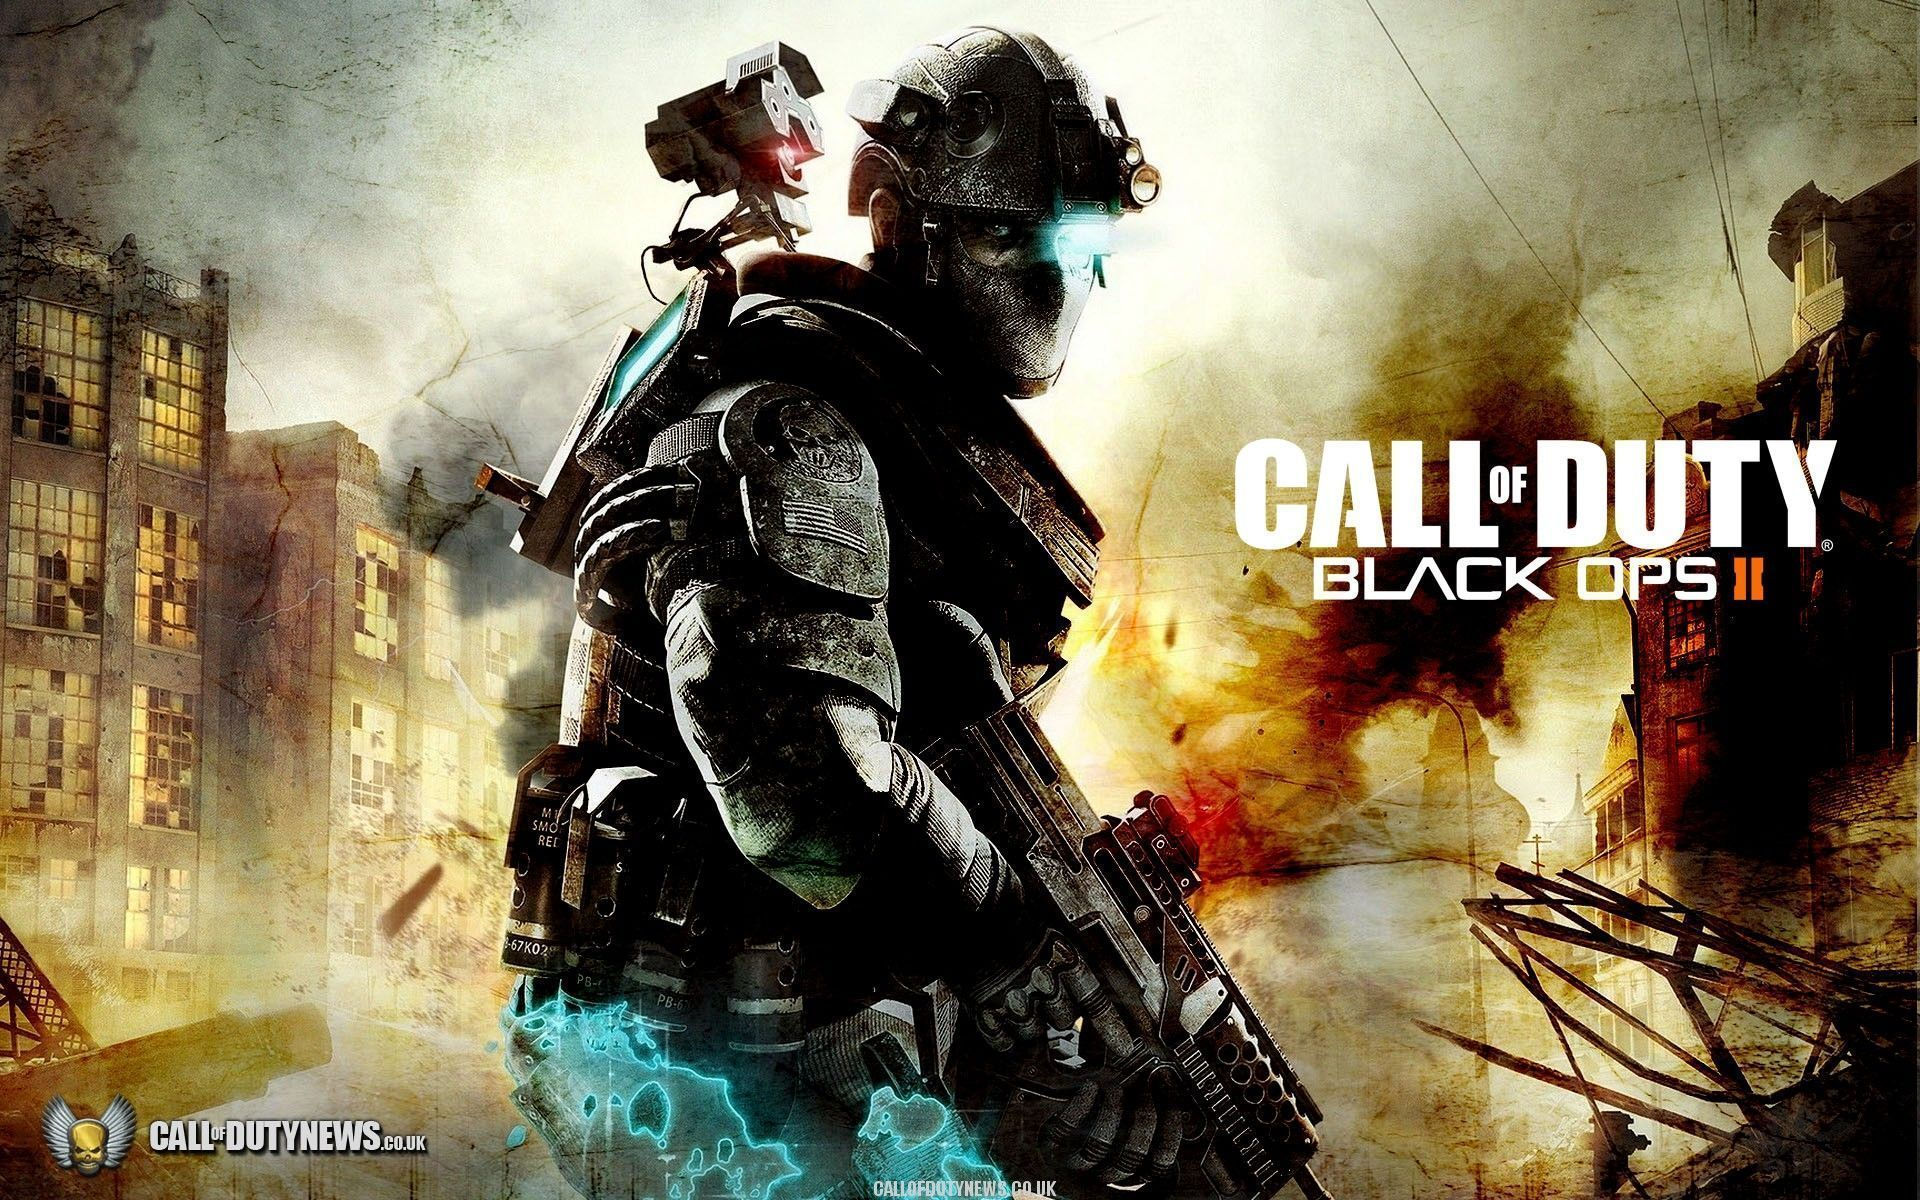 Call Of Duty Black Ops Wallpaper Wide Screen PKK 1920x1200 Backgrounds 40 Wallpapers